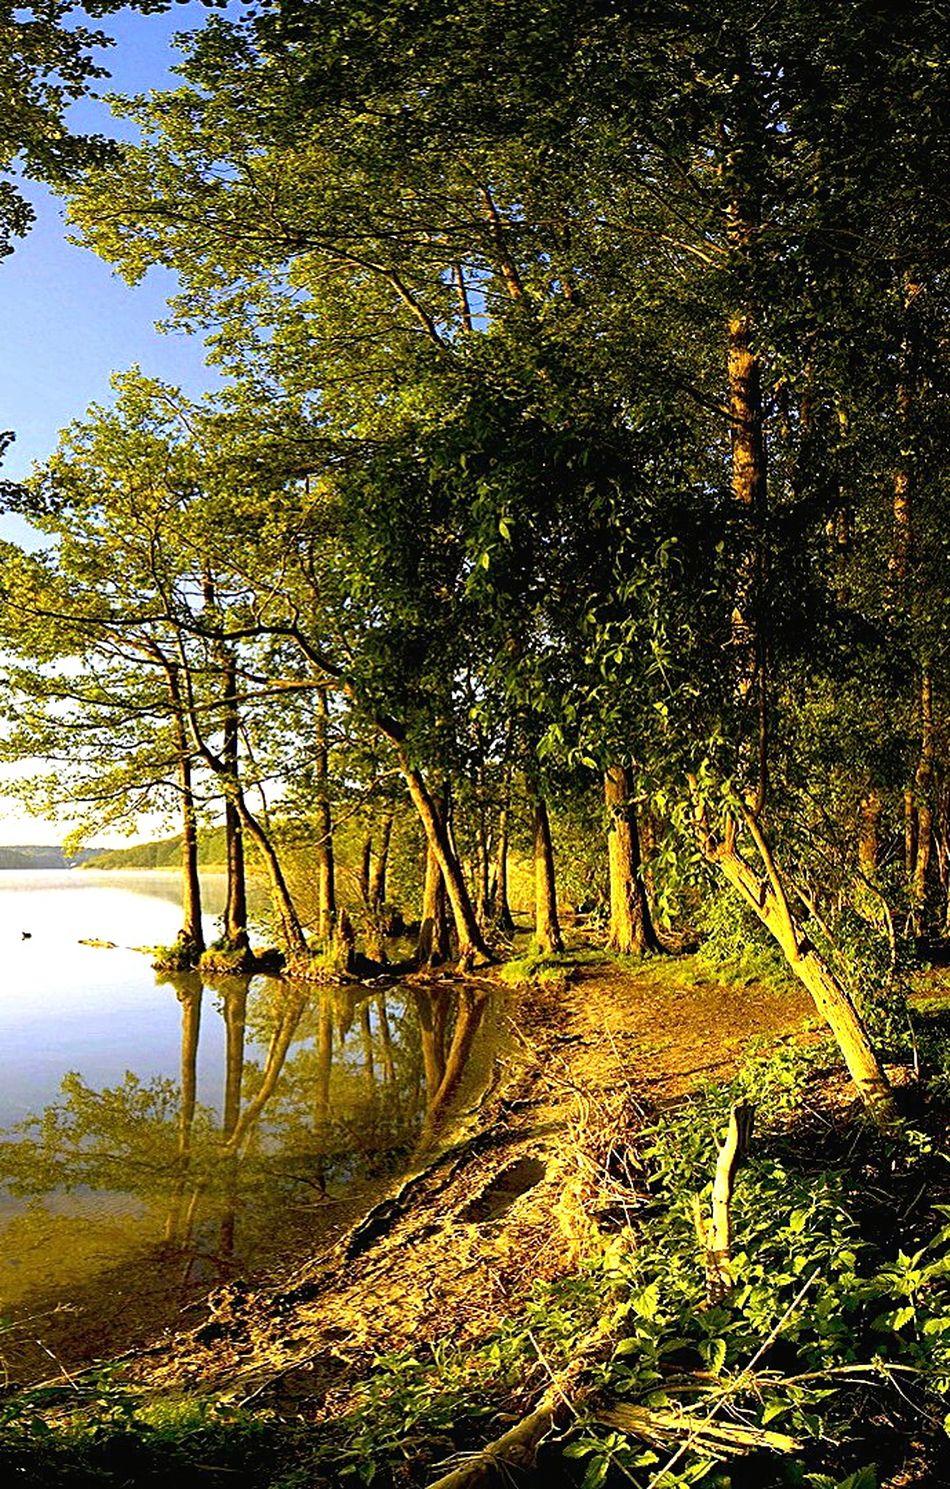 Eyeem Nature Lover. Open Edit. Taking Photos. EyeEm Best Shots - Landscape Beautiful Nature River Side.